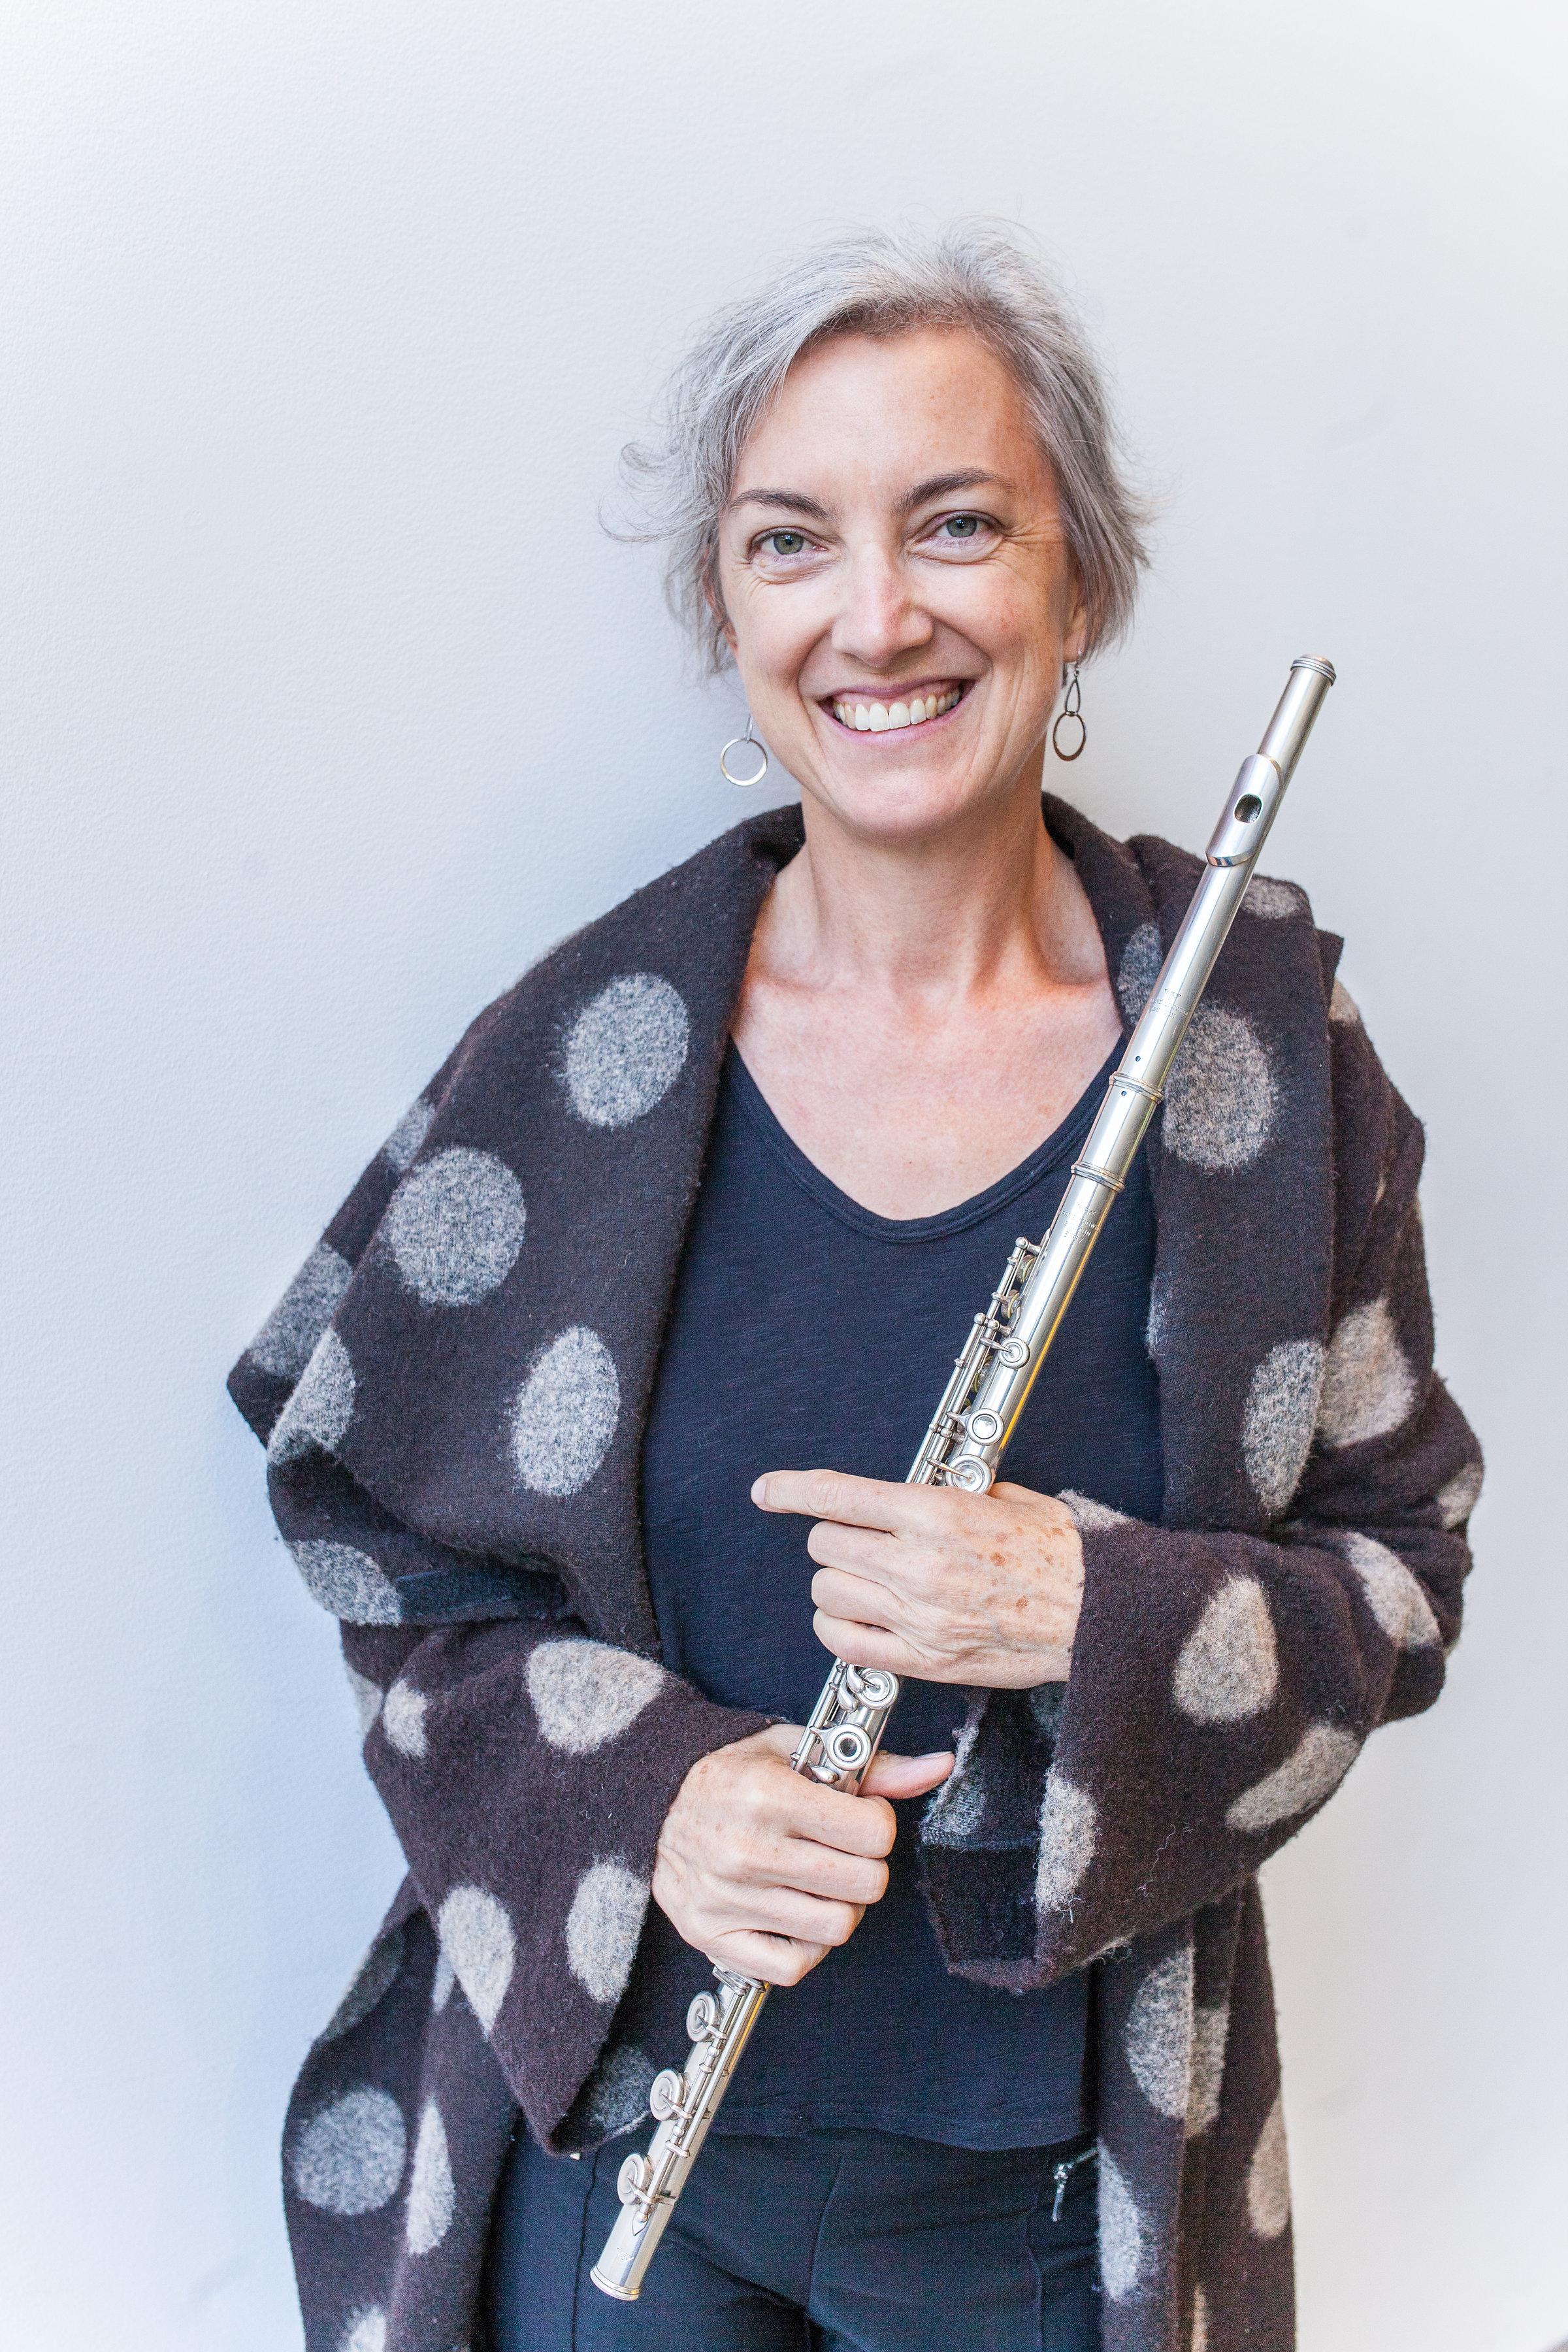 Stacey Pelinka, flute